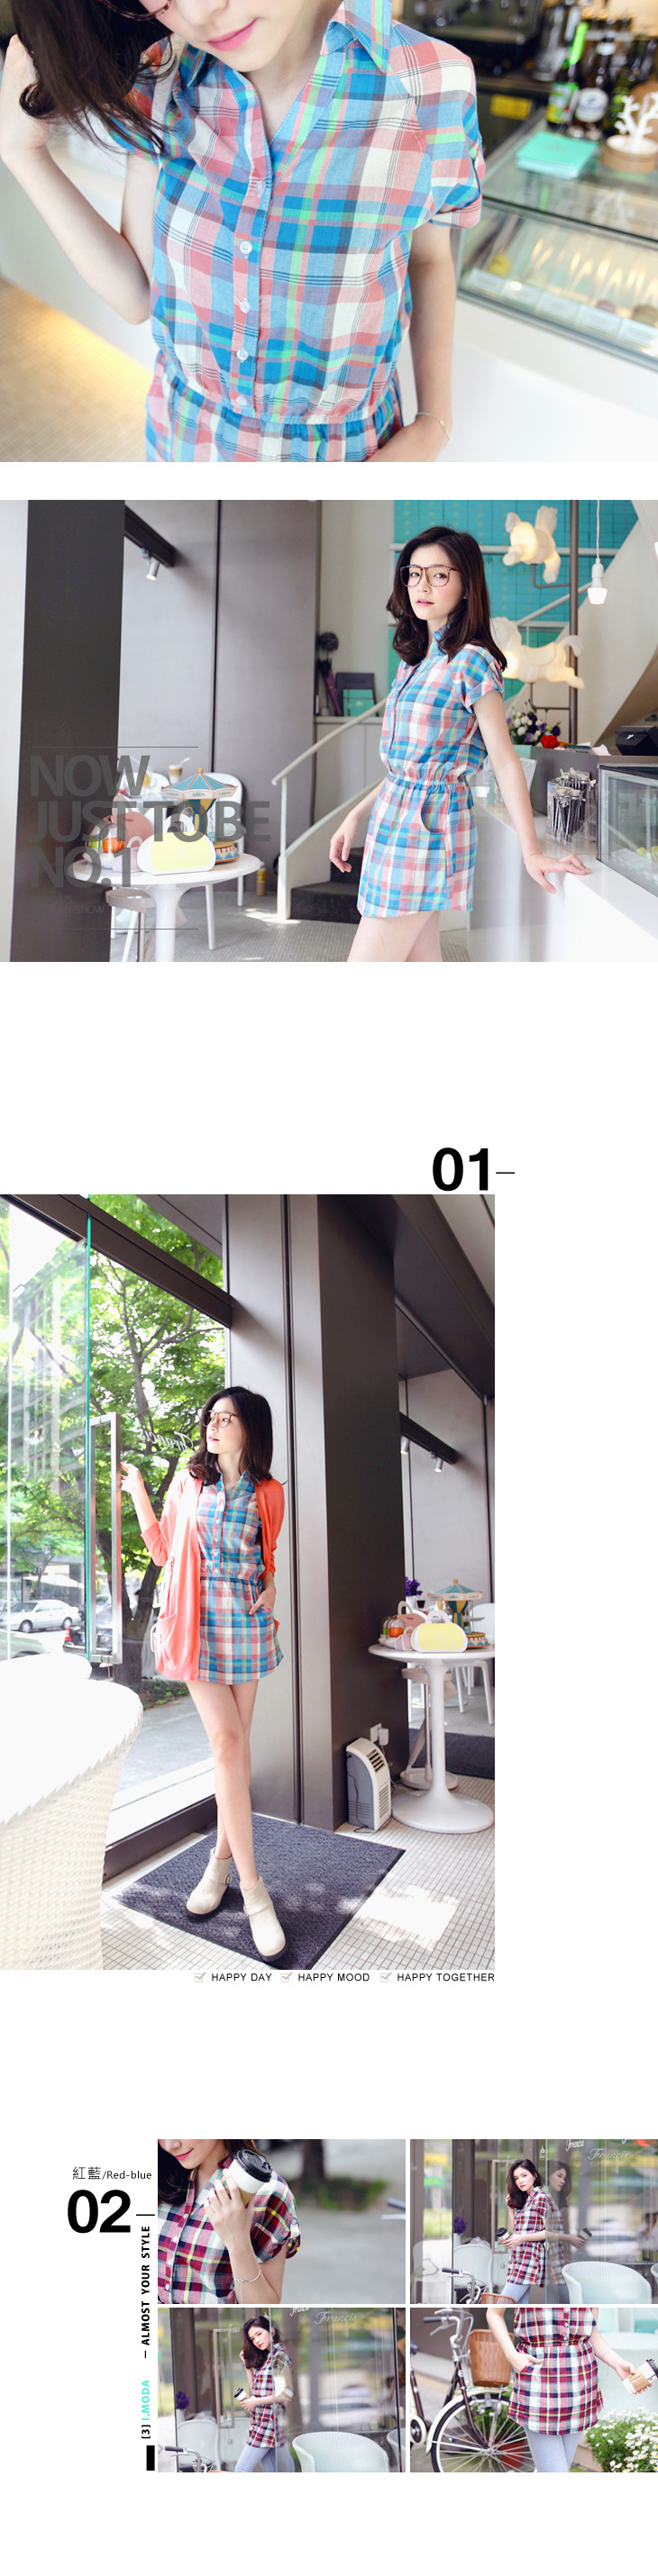 ob嚴選衣 新年必備0924新品 彩色心情~繽紛格紋縮腰襯衫洋裝‧2色 ...